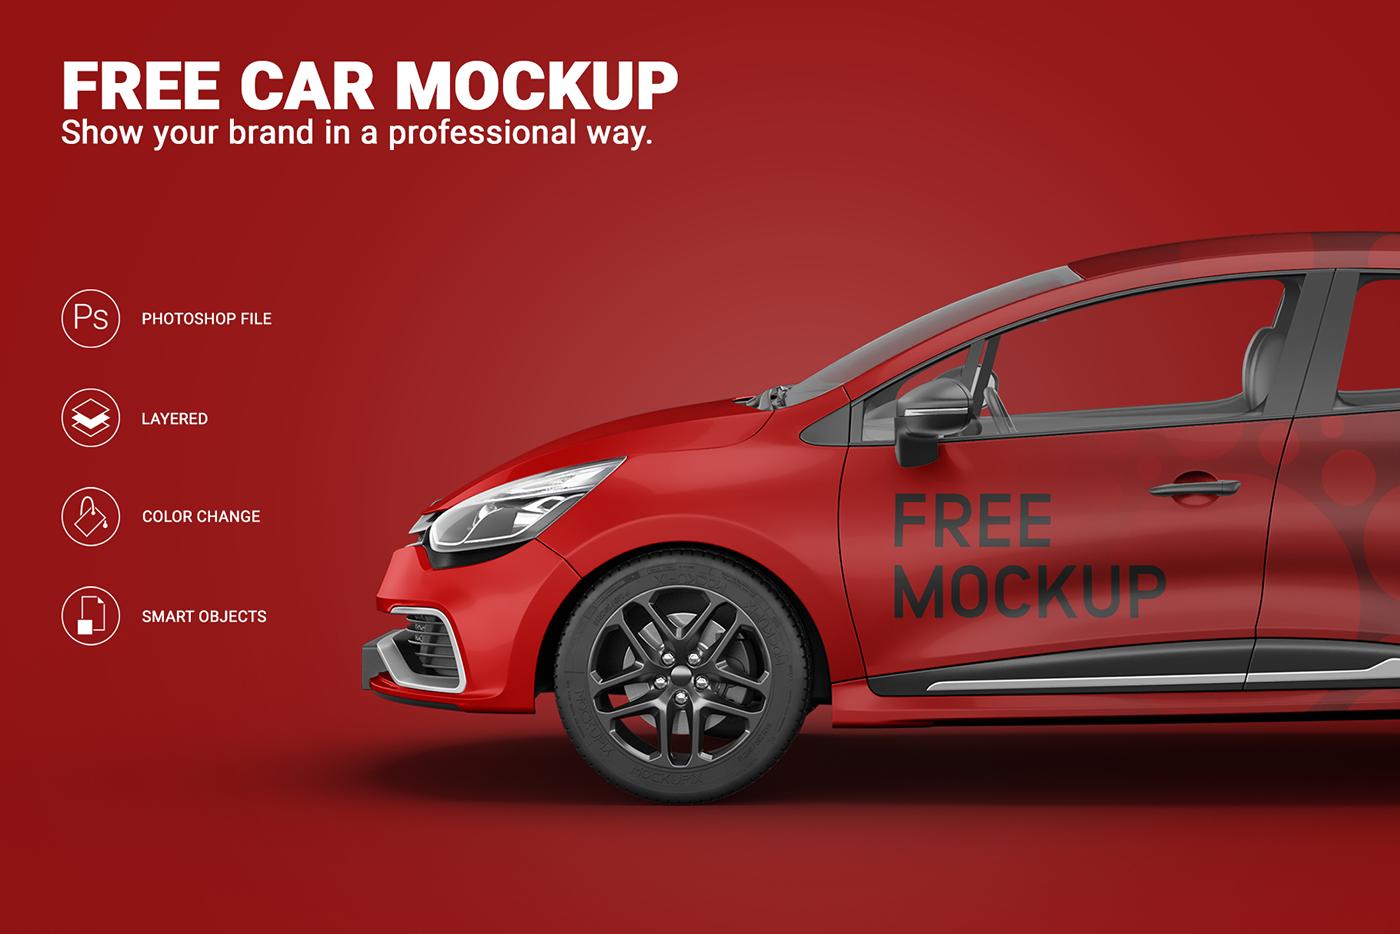 Vehicle mockup car free template wraps branding  advert photoshop identity freebie